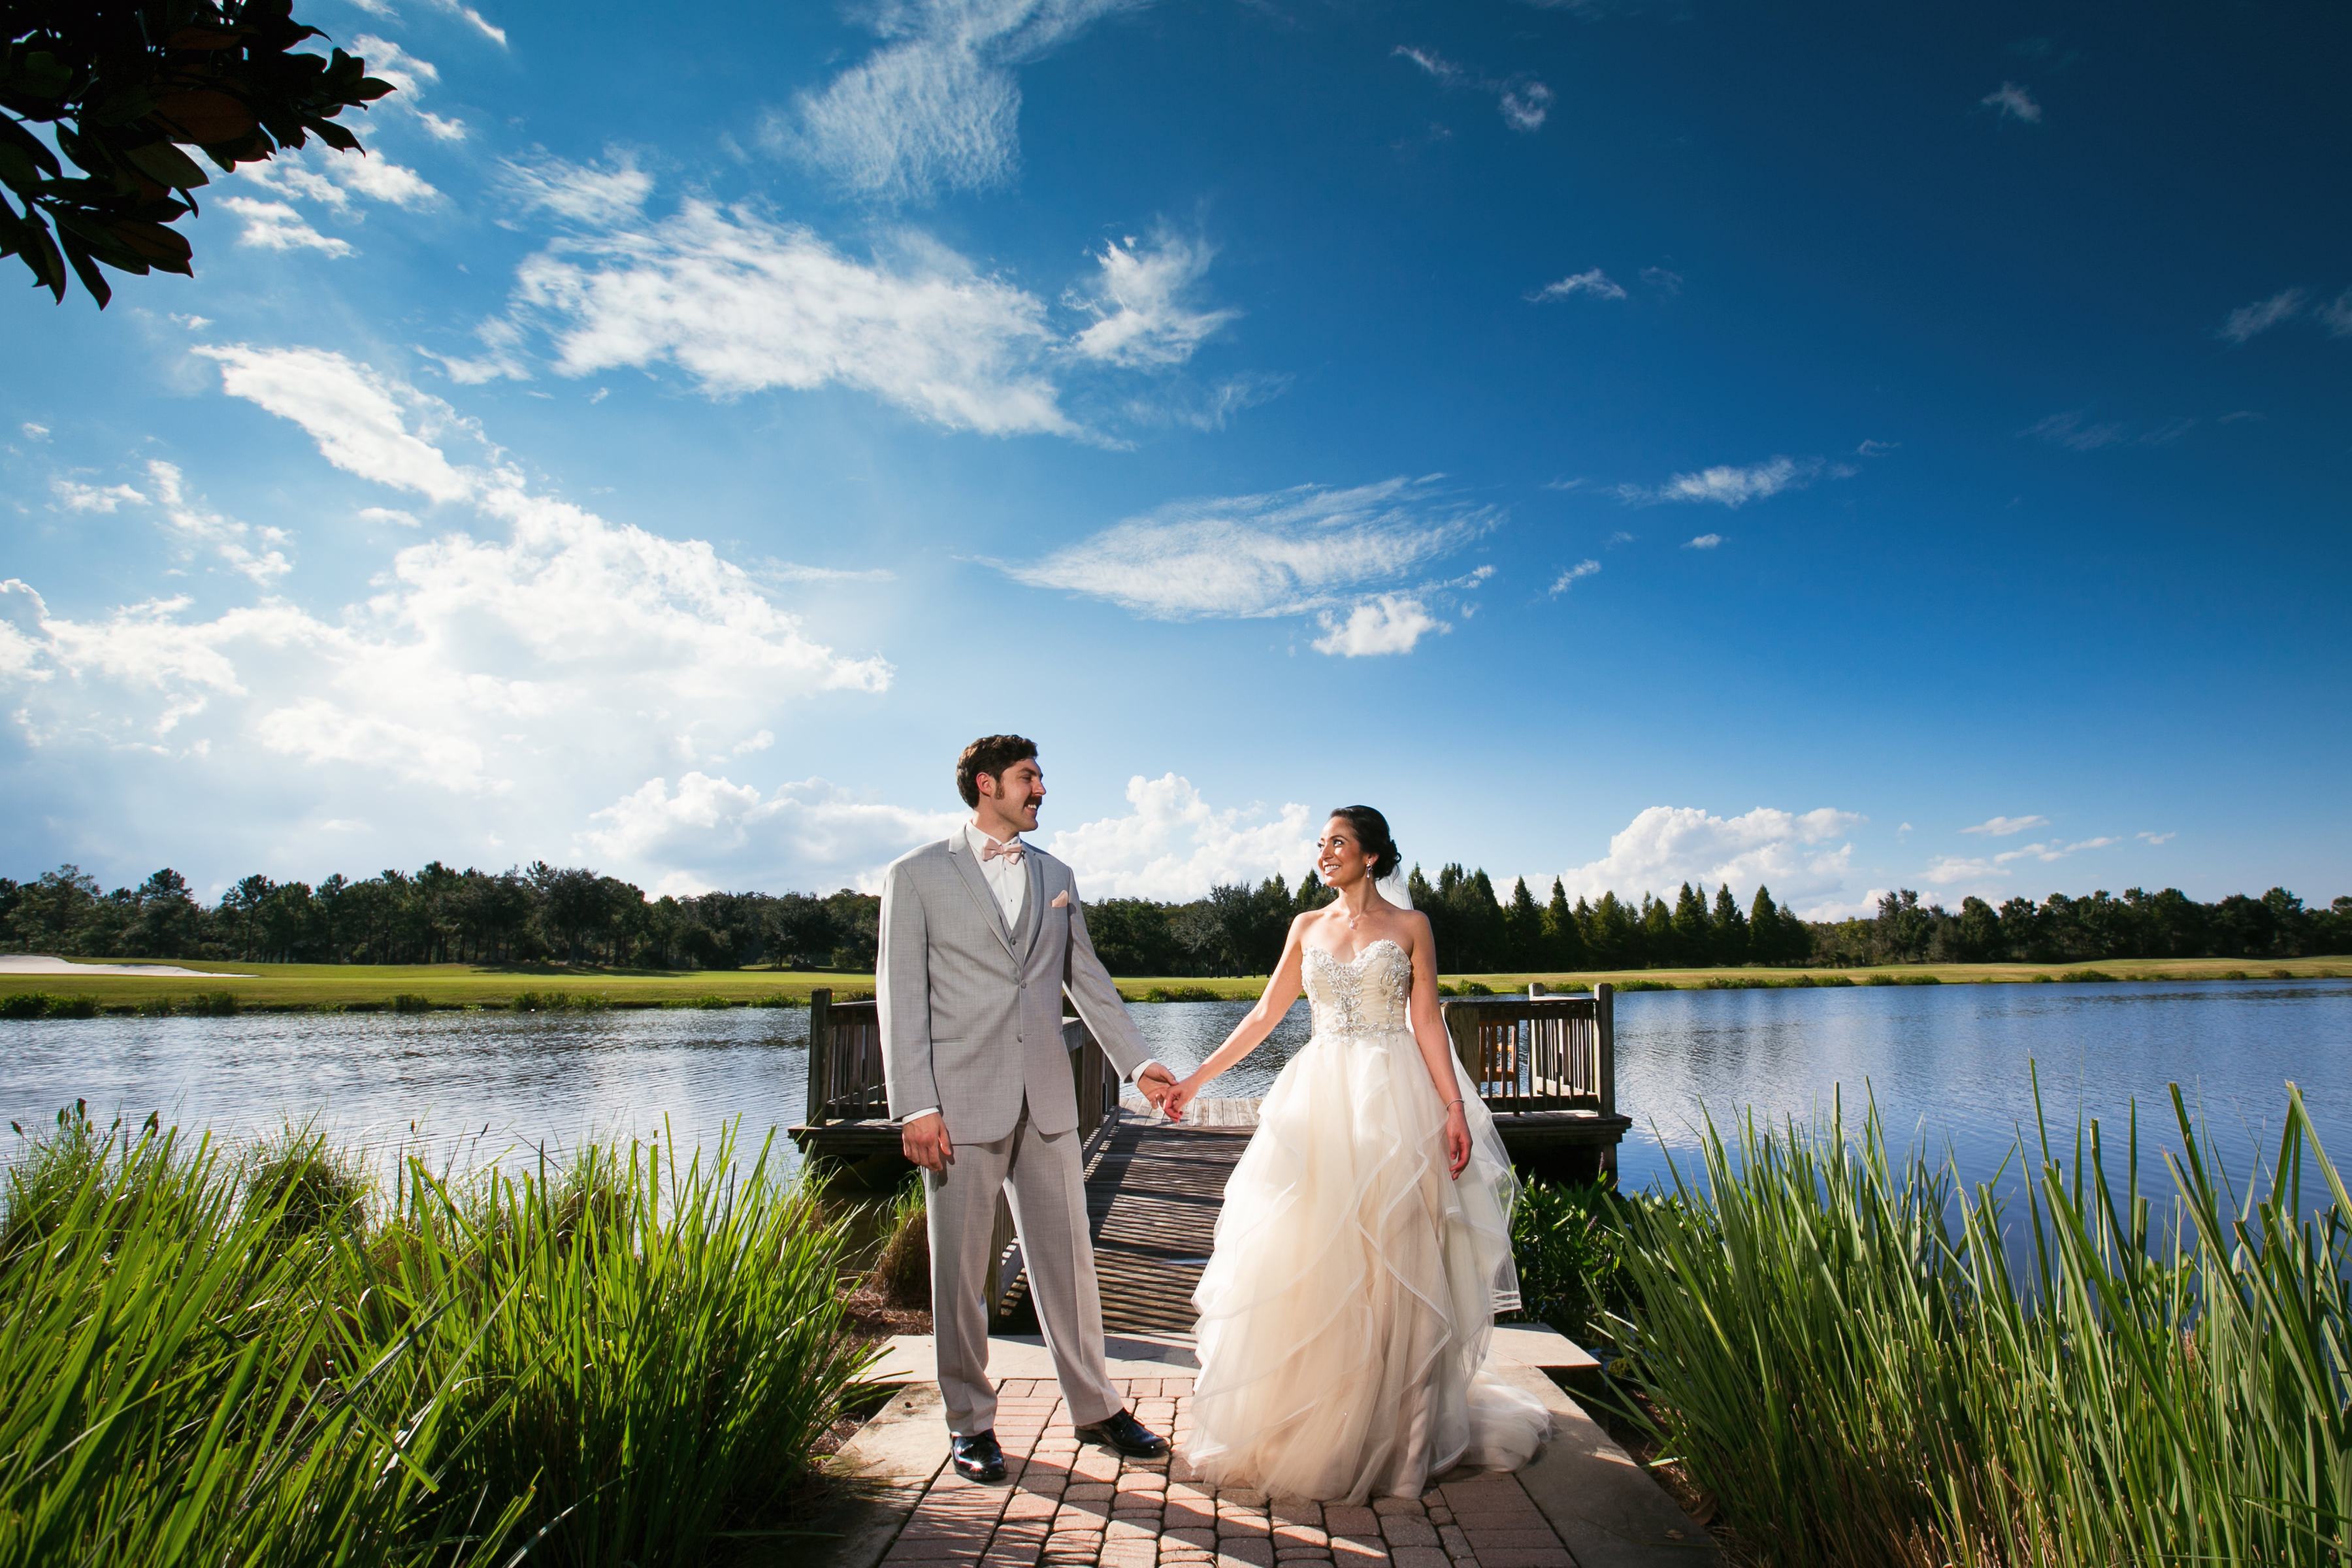 151010-Falcon-Wedding-3429-Edit